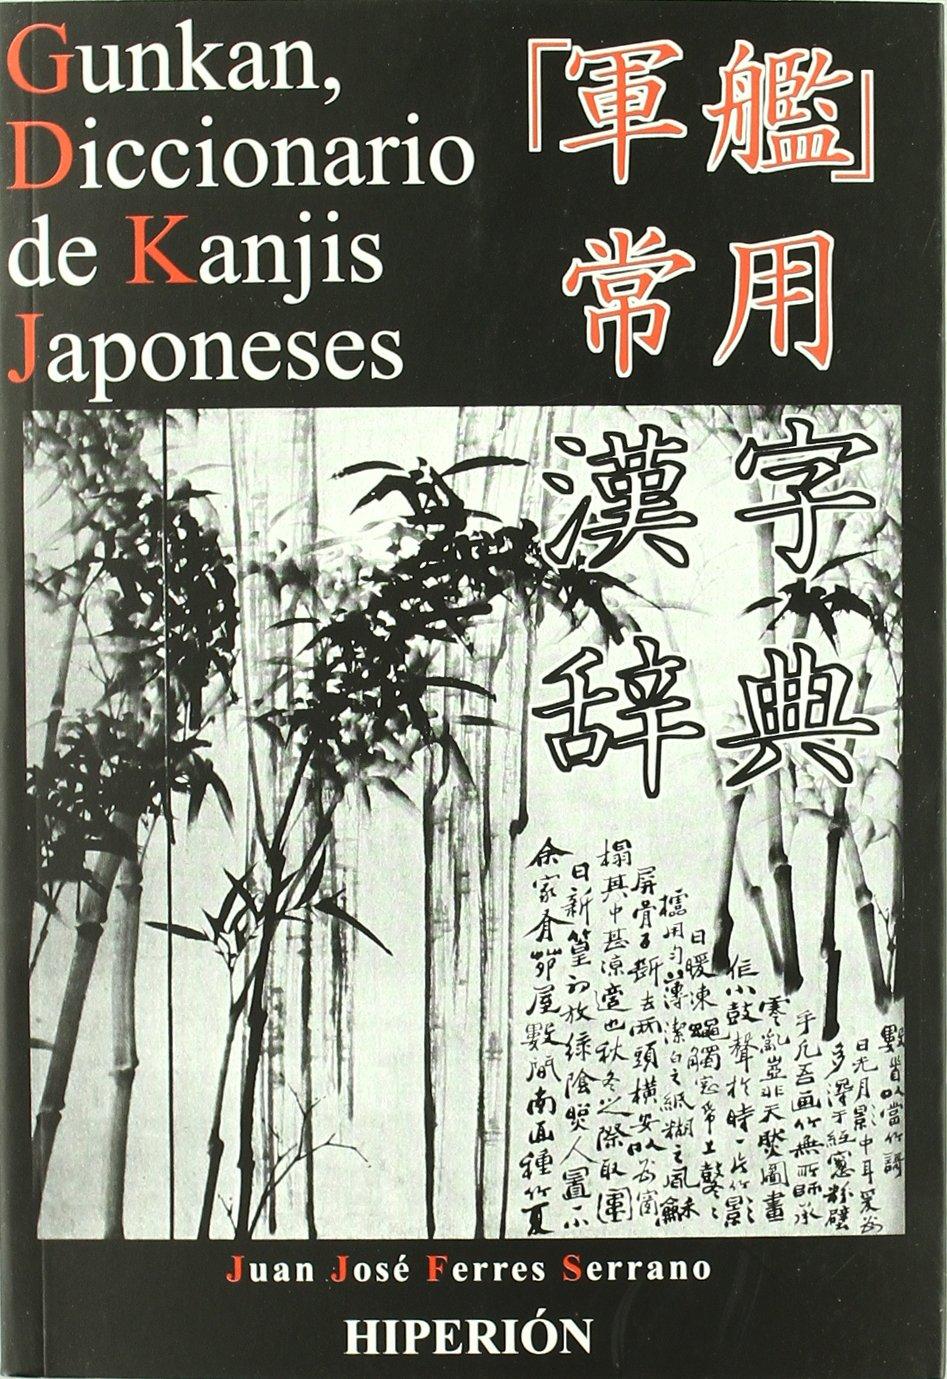 Gunkan, diccionario de kanjis Japoneses: 2229 Kanjis Japoneses (Hiperión) Tapa blanda – 12 dic 2000 Juan José Ferres Serrano 8475176801 BOG_LIB_U_013066 LENGUAS